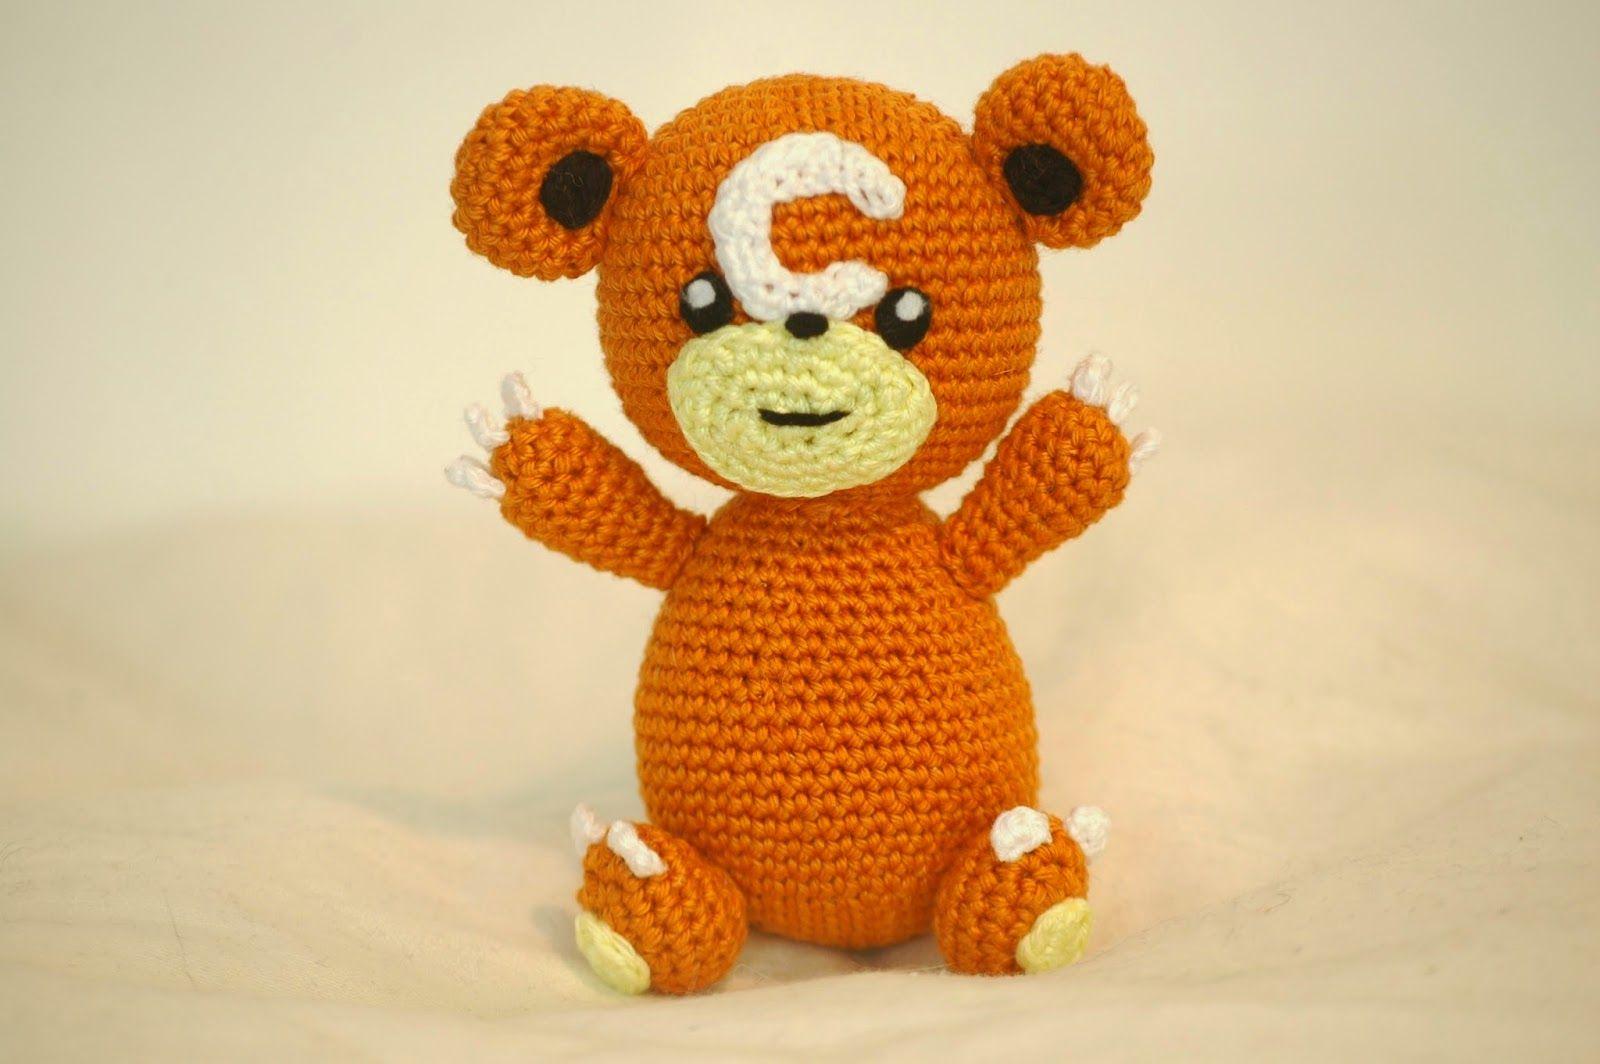 Crochet pattern Teddiursa   Pokémon